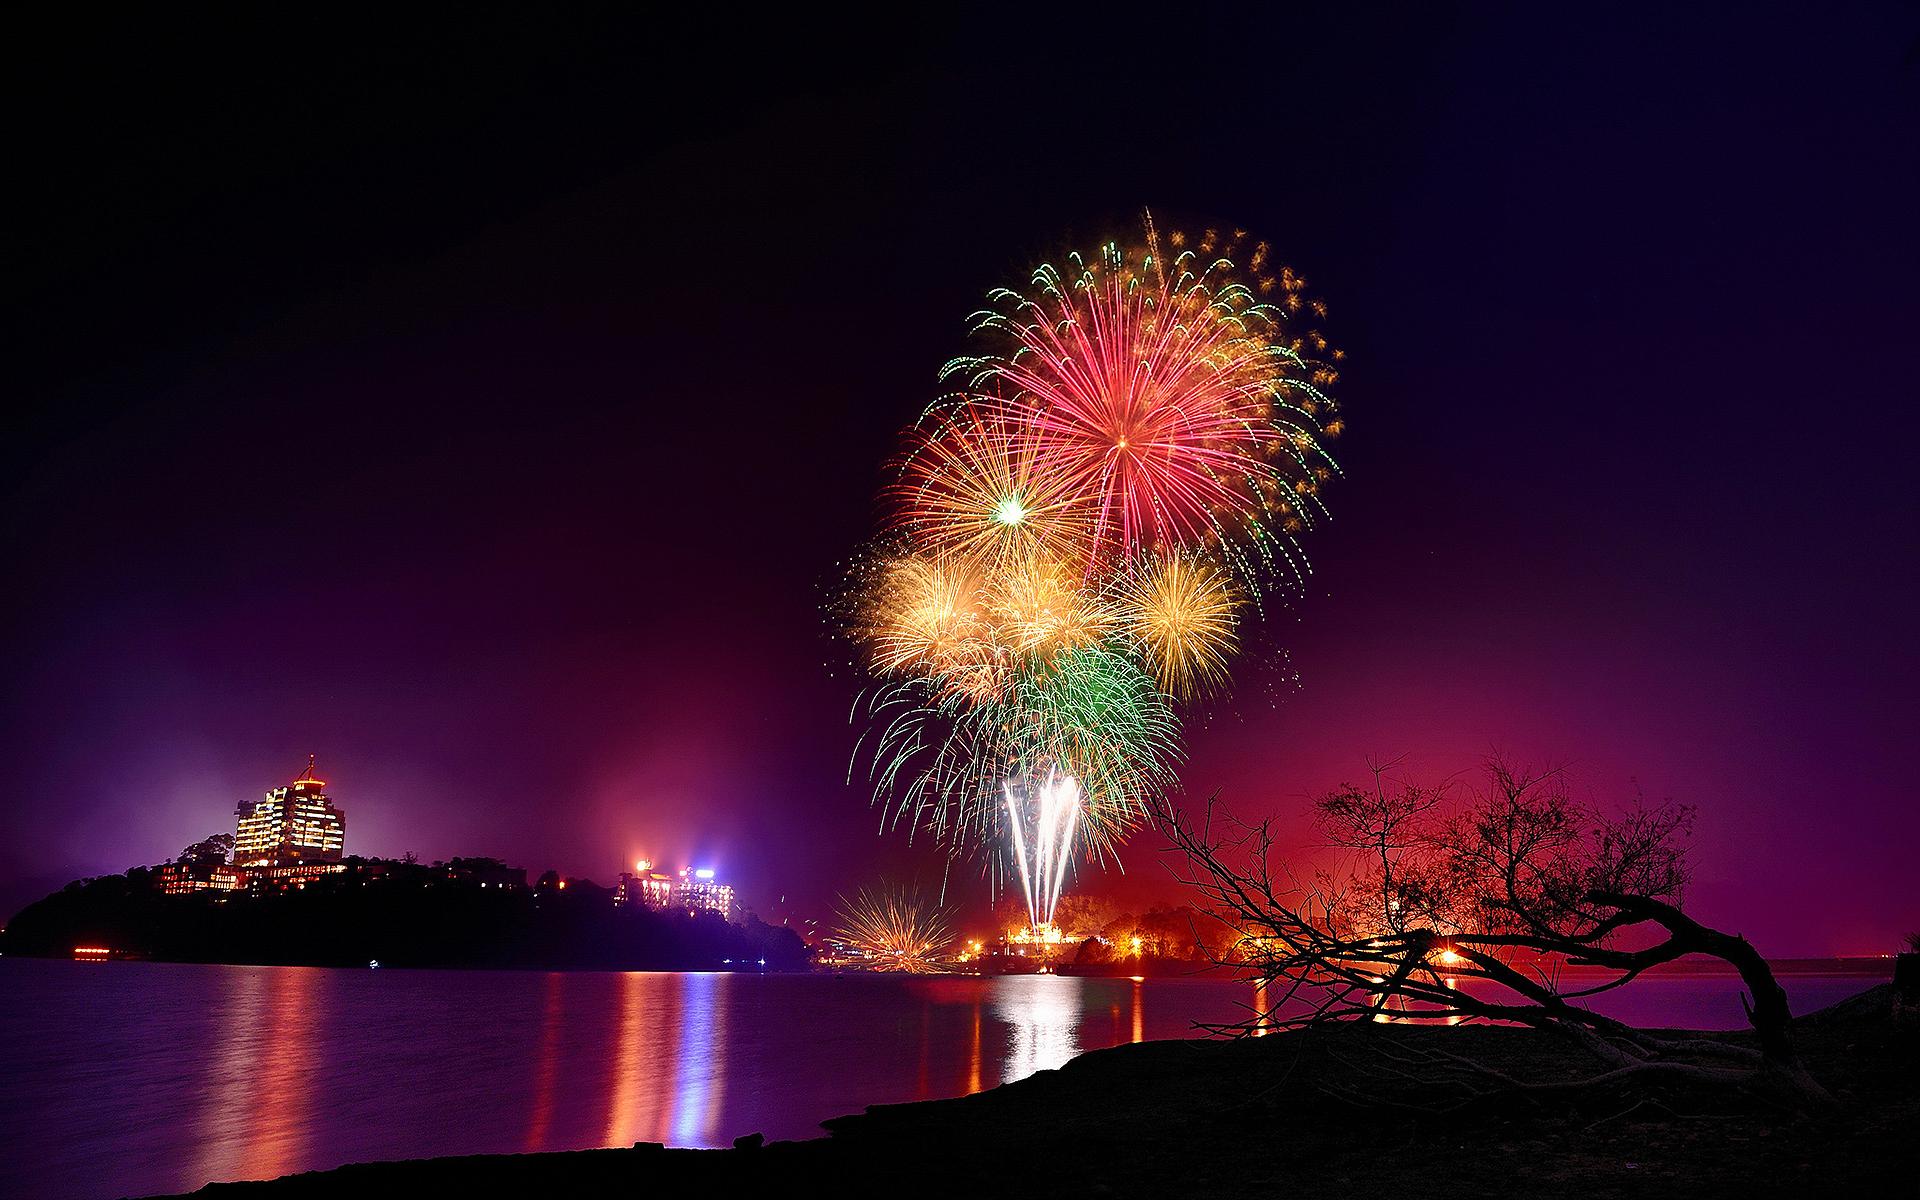 Fireworks city night